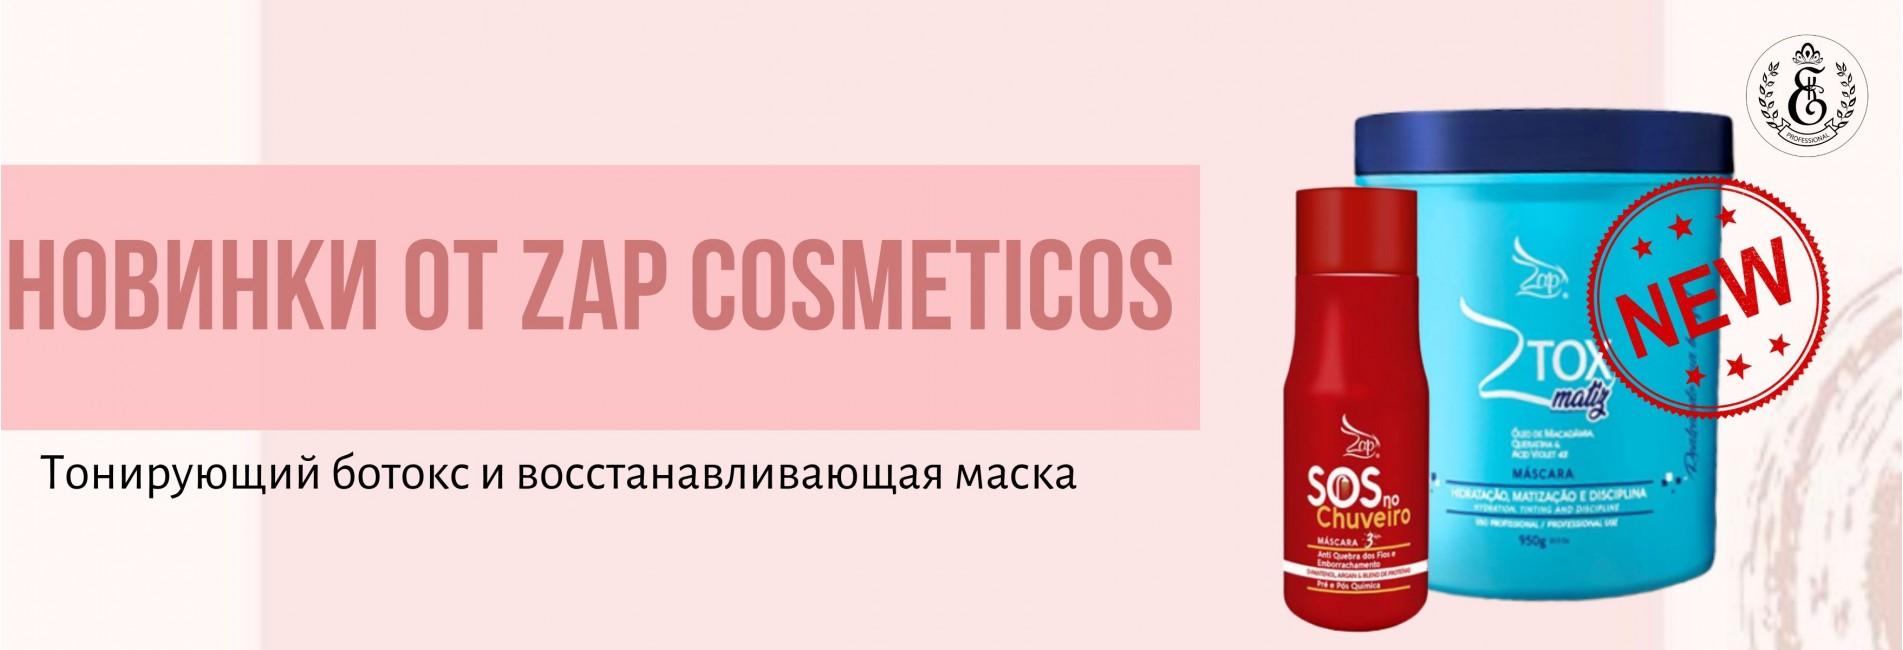 новинки от zap cosmeticos